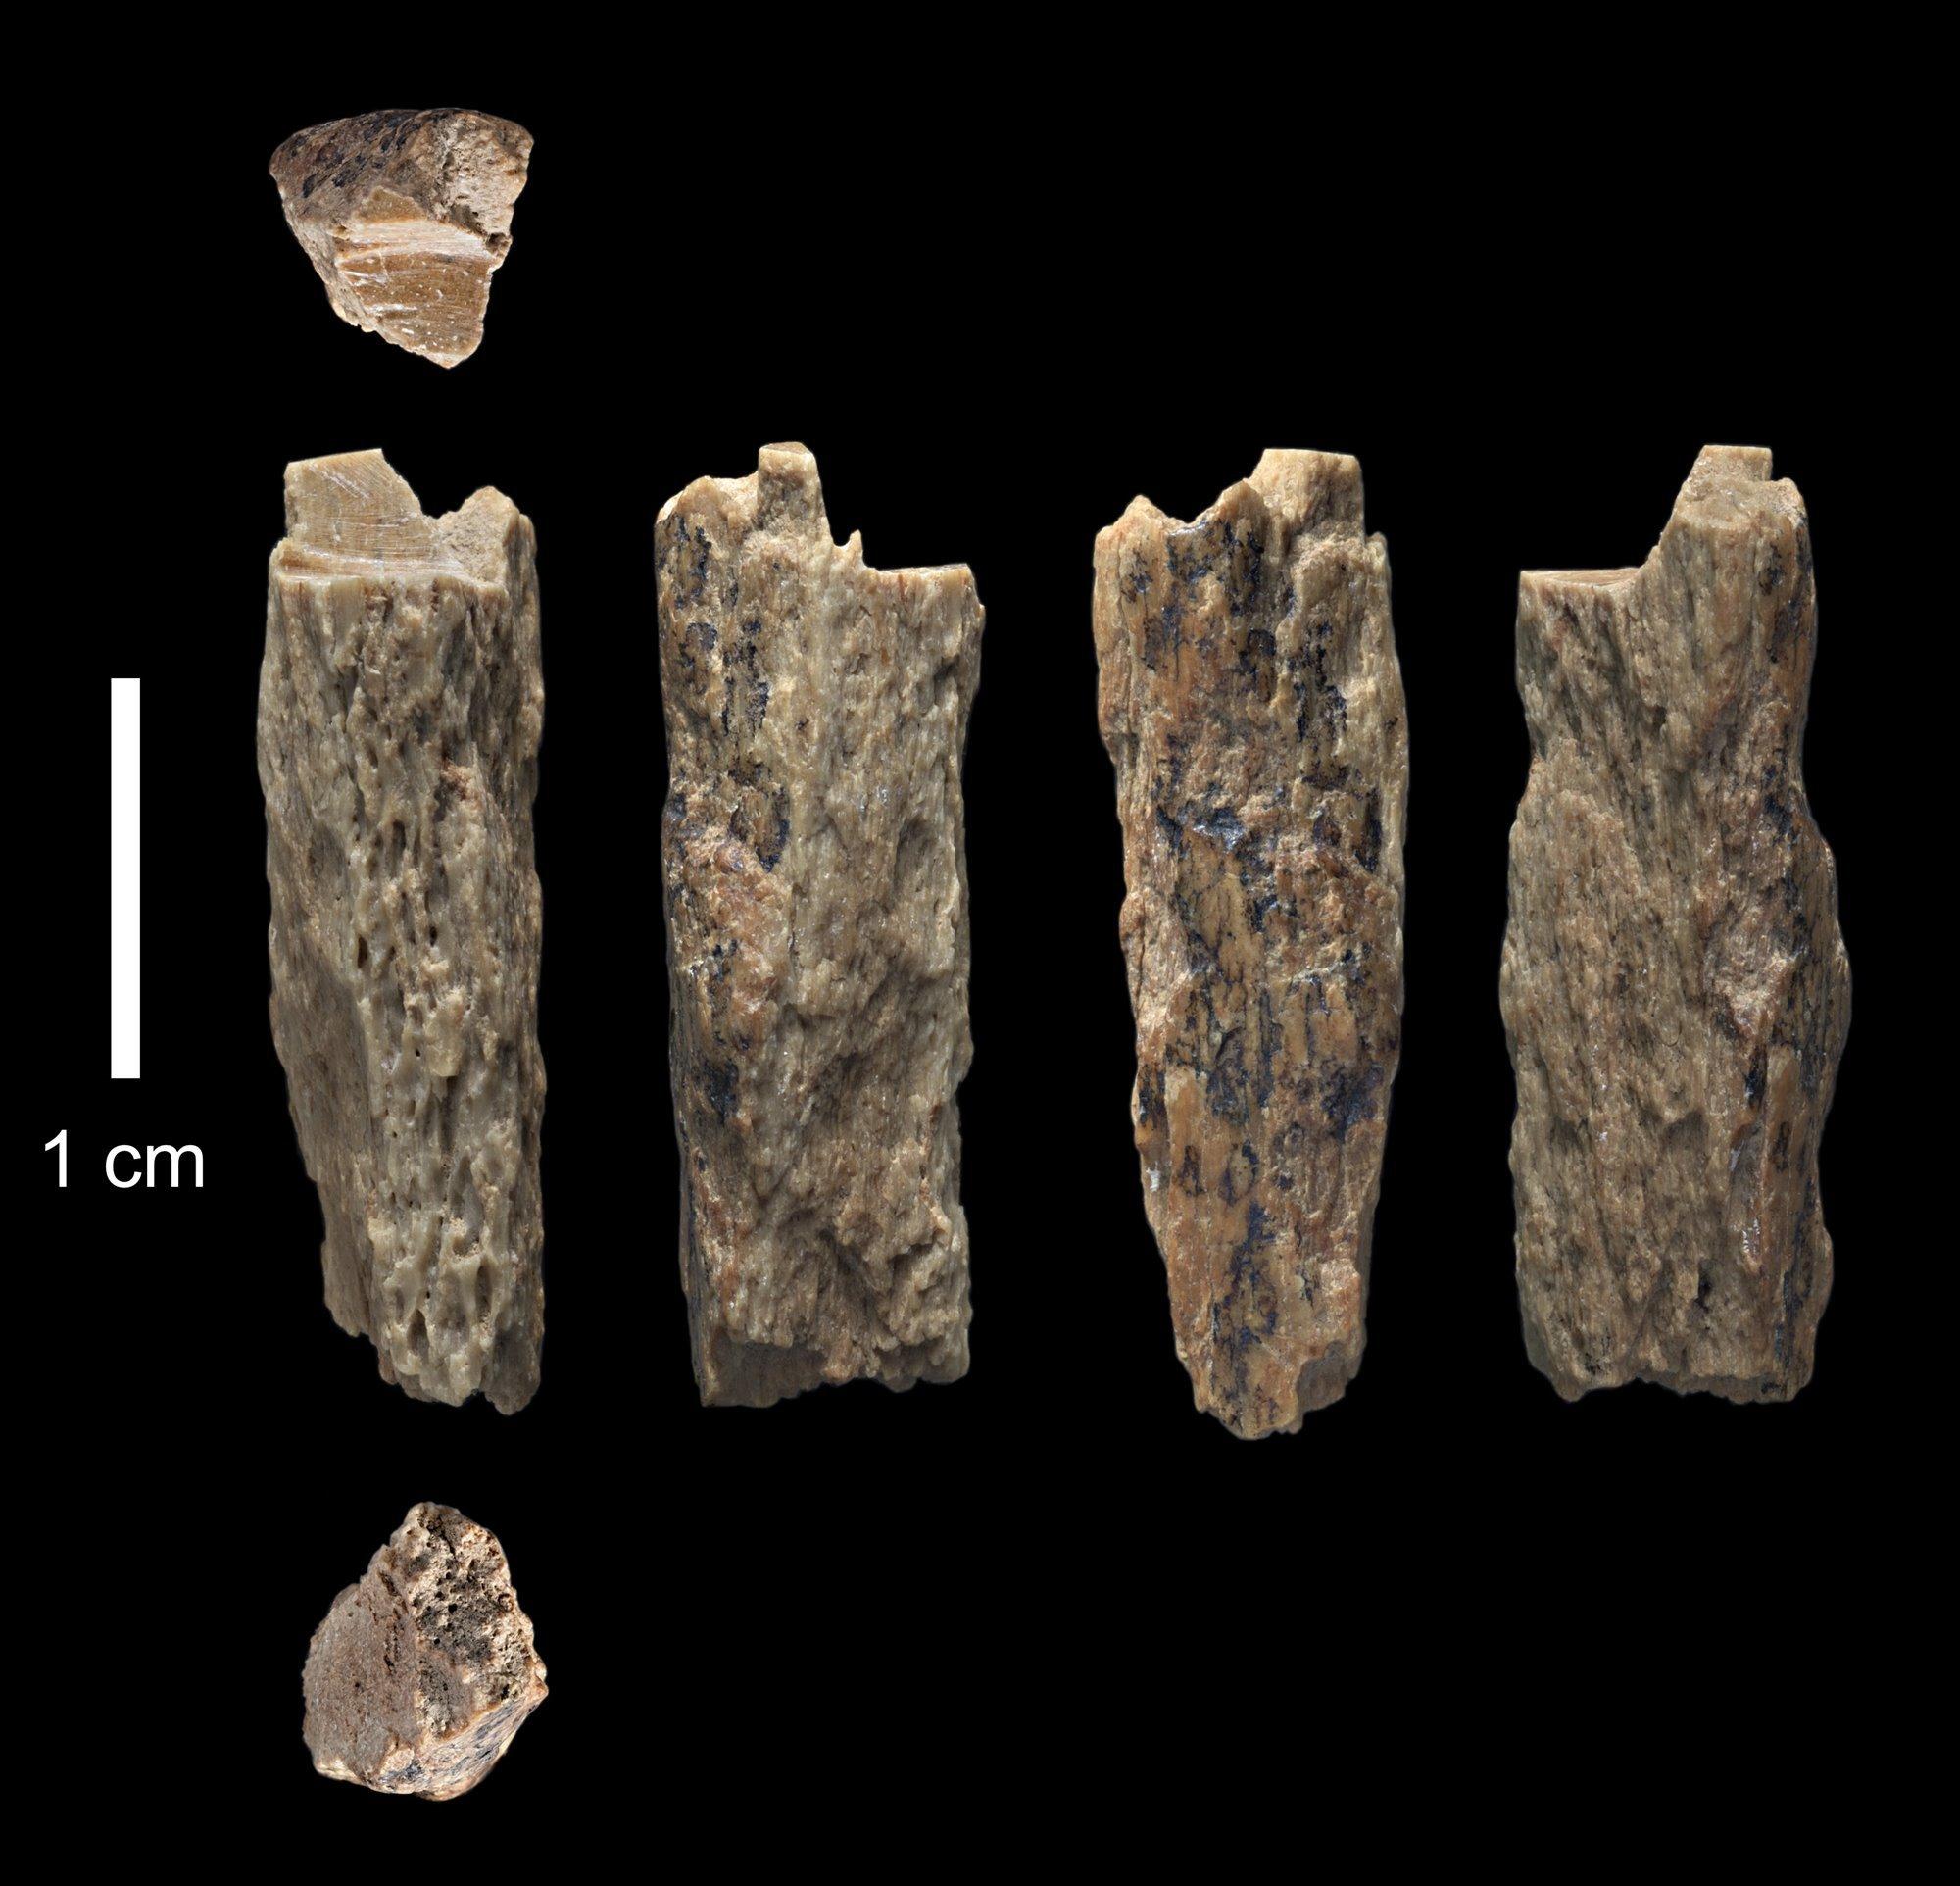 denisova11. De madre neandertal y de padre denisovano